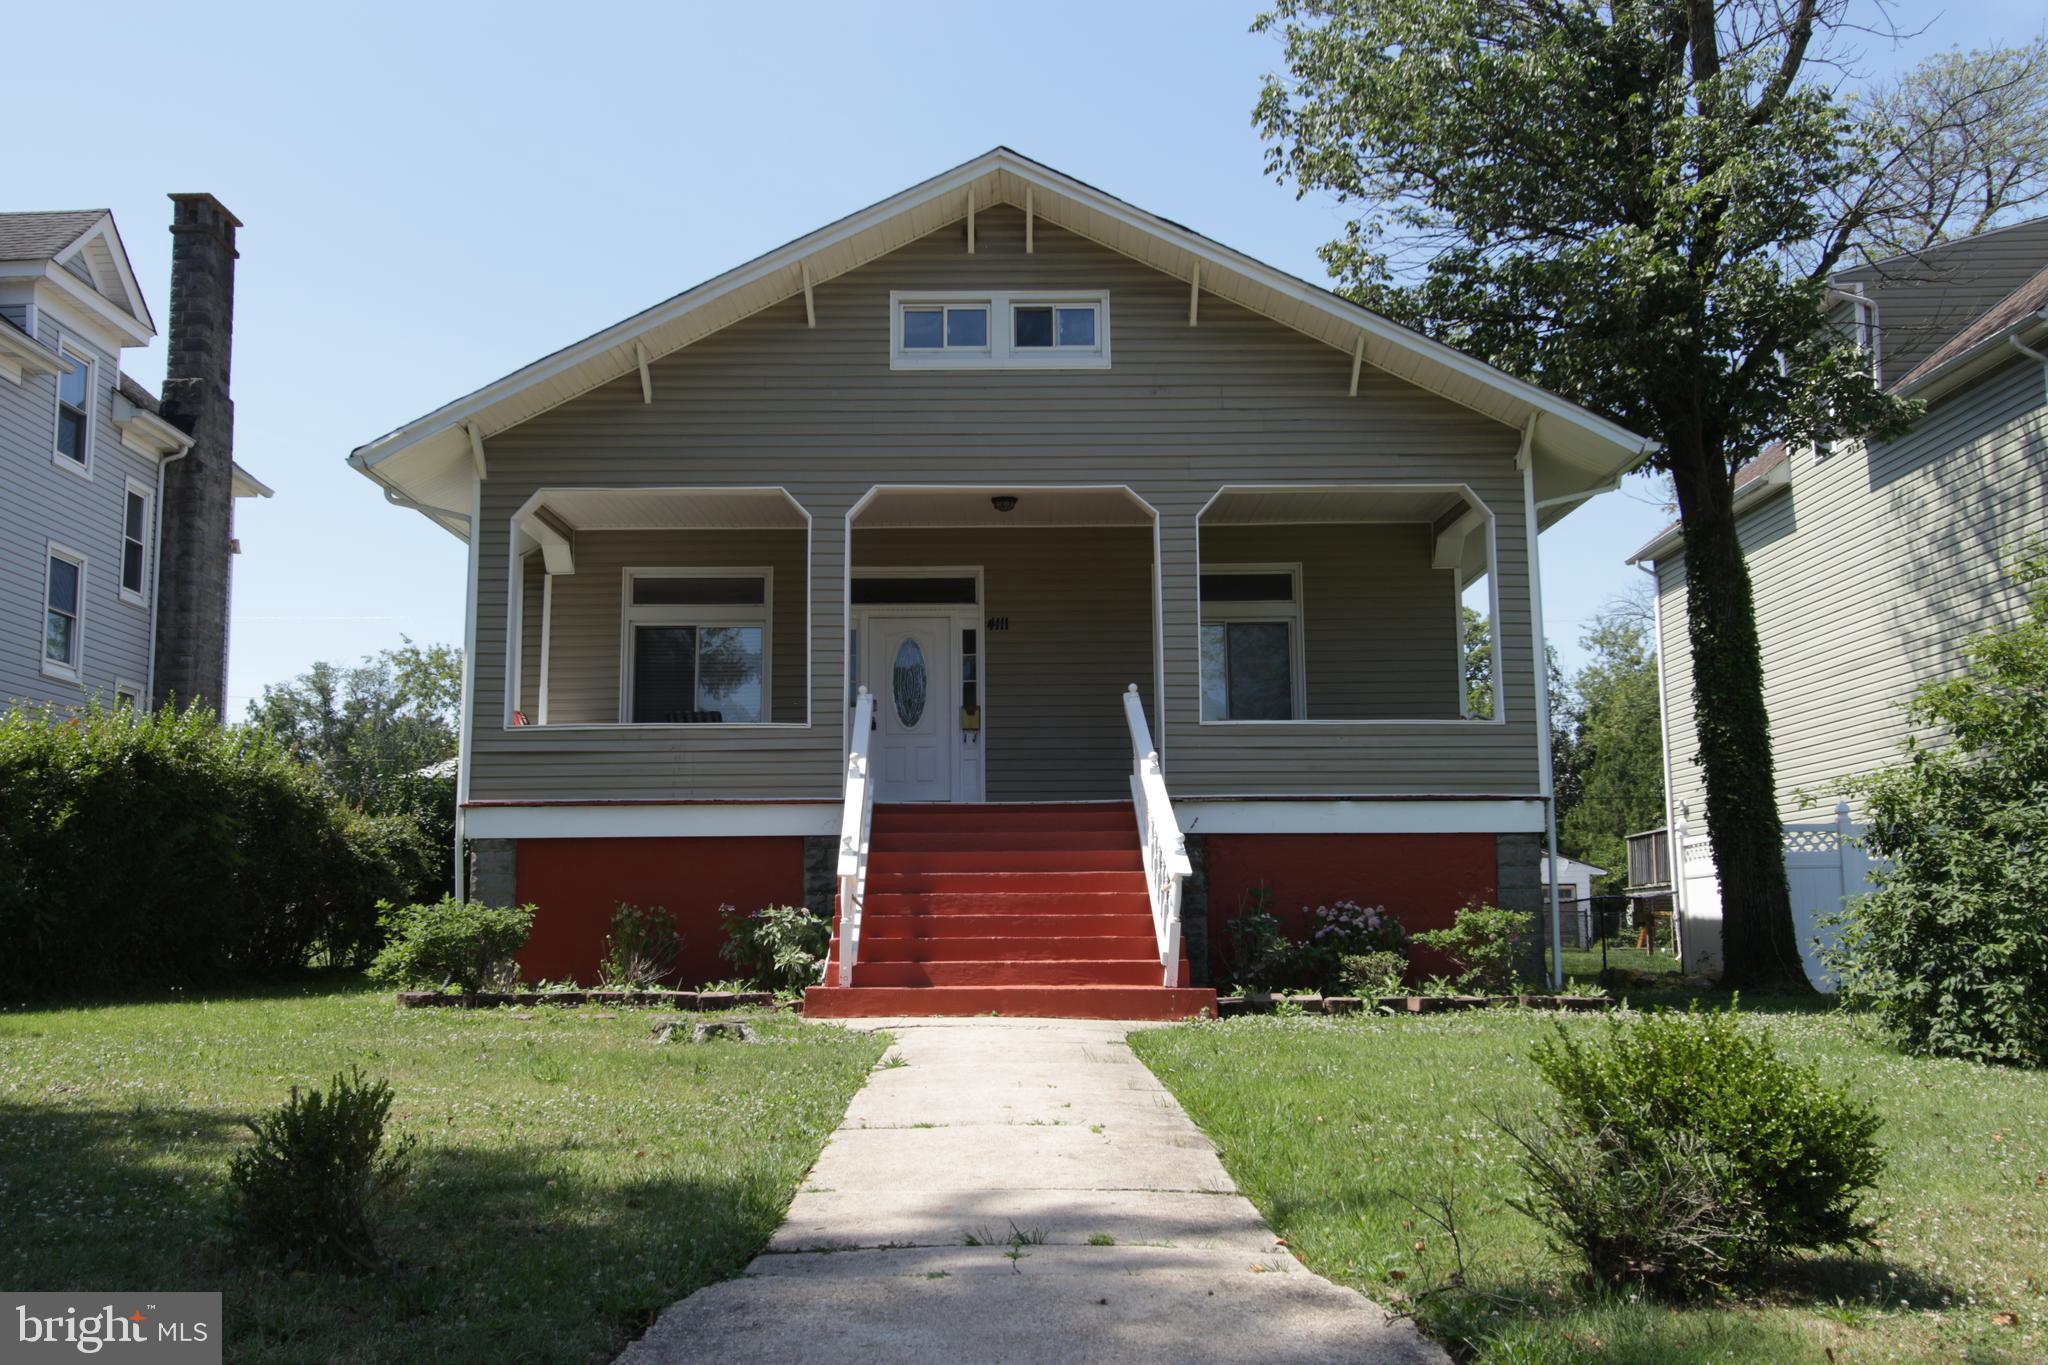 Real Estate Information - John and Mary Luca Hockessin, Greenville